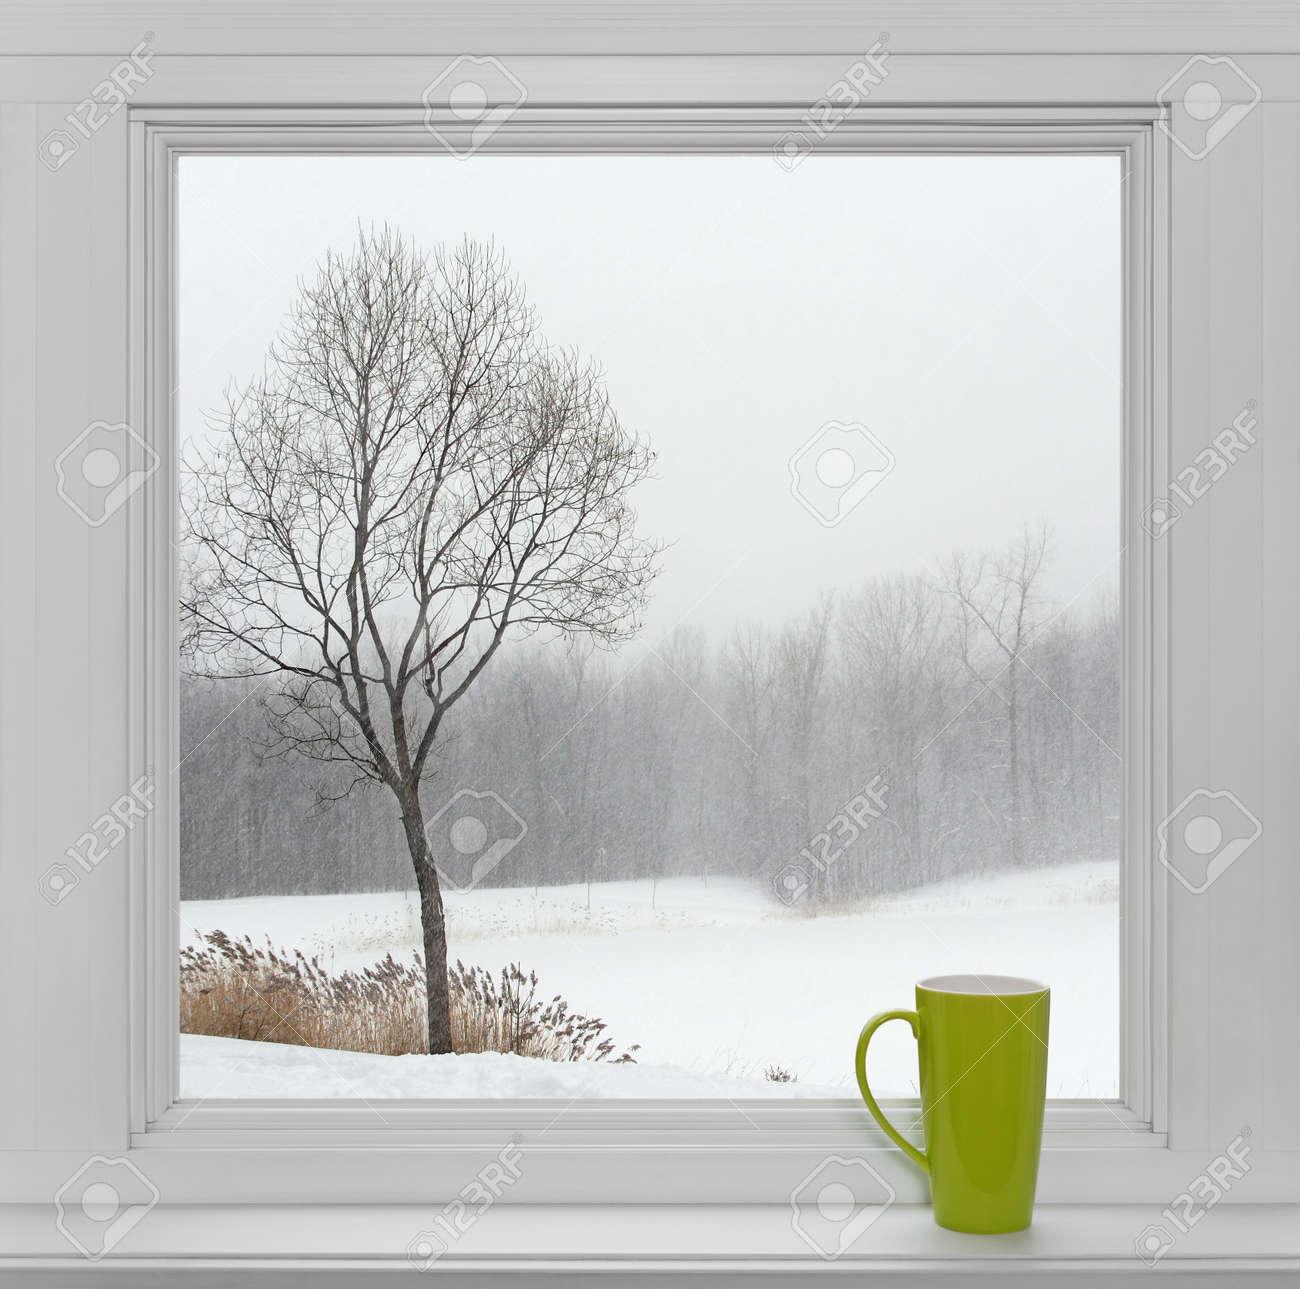 Modern window sill - Window Sill Green Teacup On A Windowsill With Winter Landscape Seen Through The Window